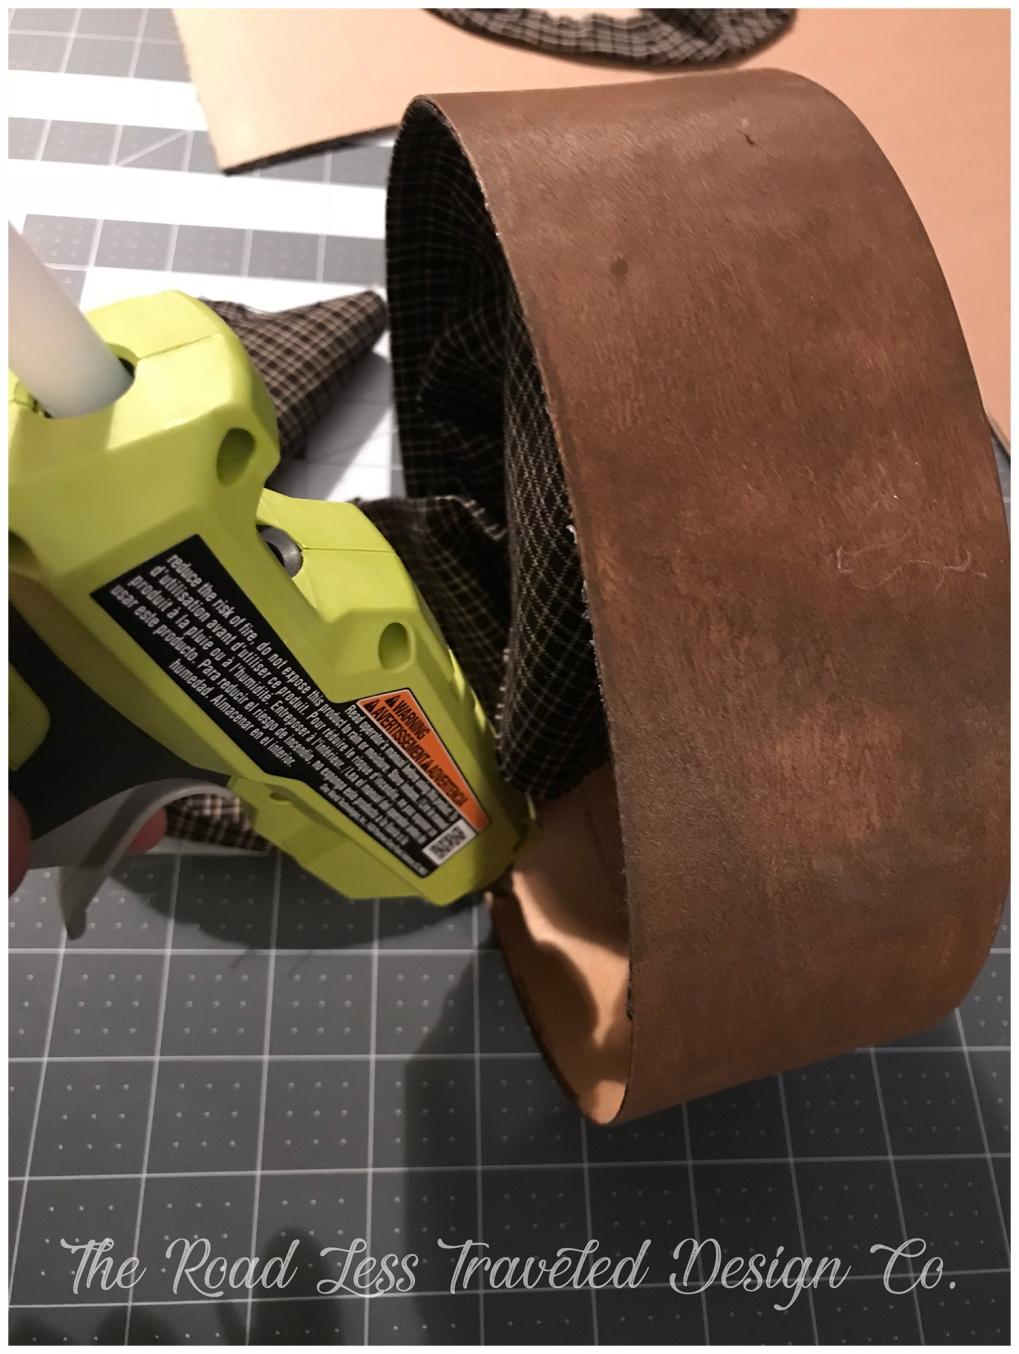 Bead of Glue Along Edge